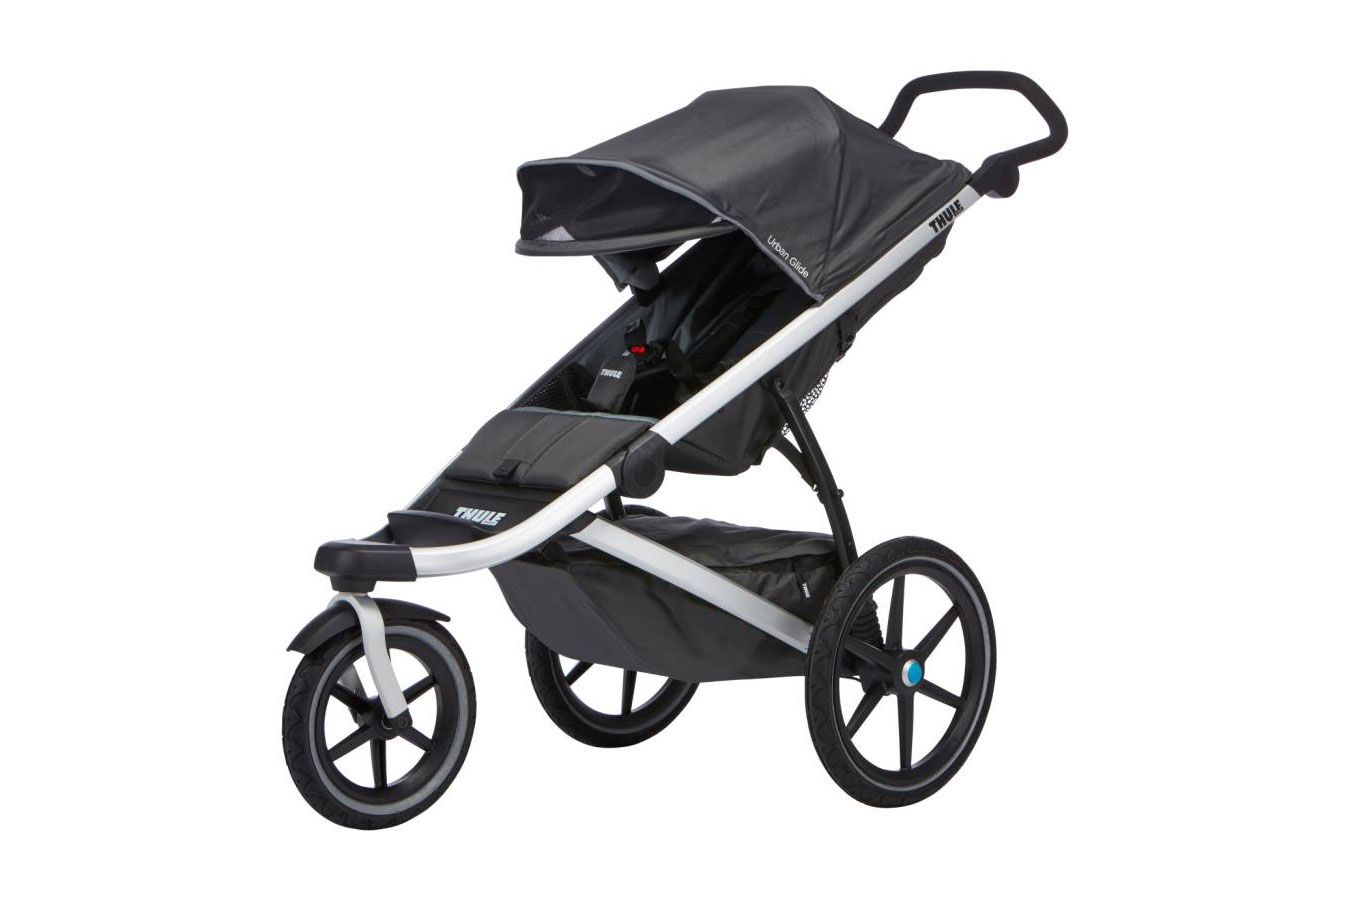 Thule Urban Glide Jogging Stroller